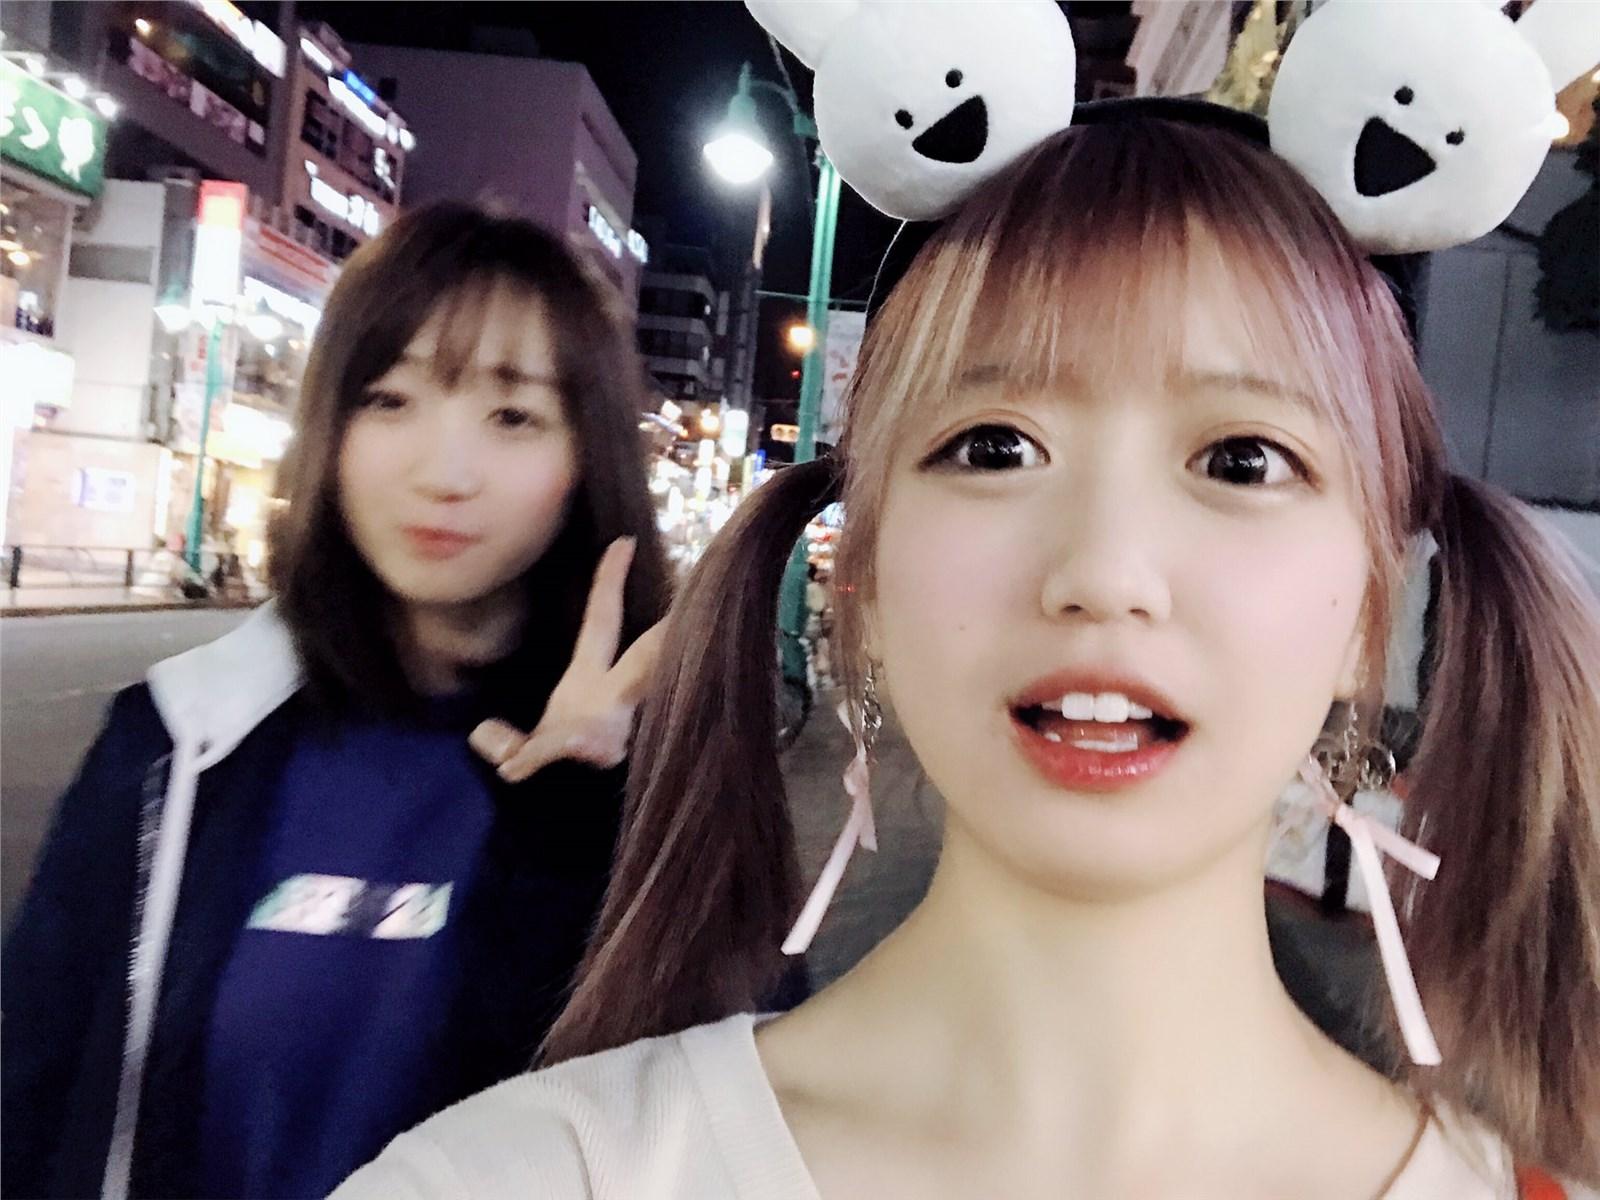 童颜巨乳COSER小姐姐yami推特图集 Yami-twitter9(18)